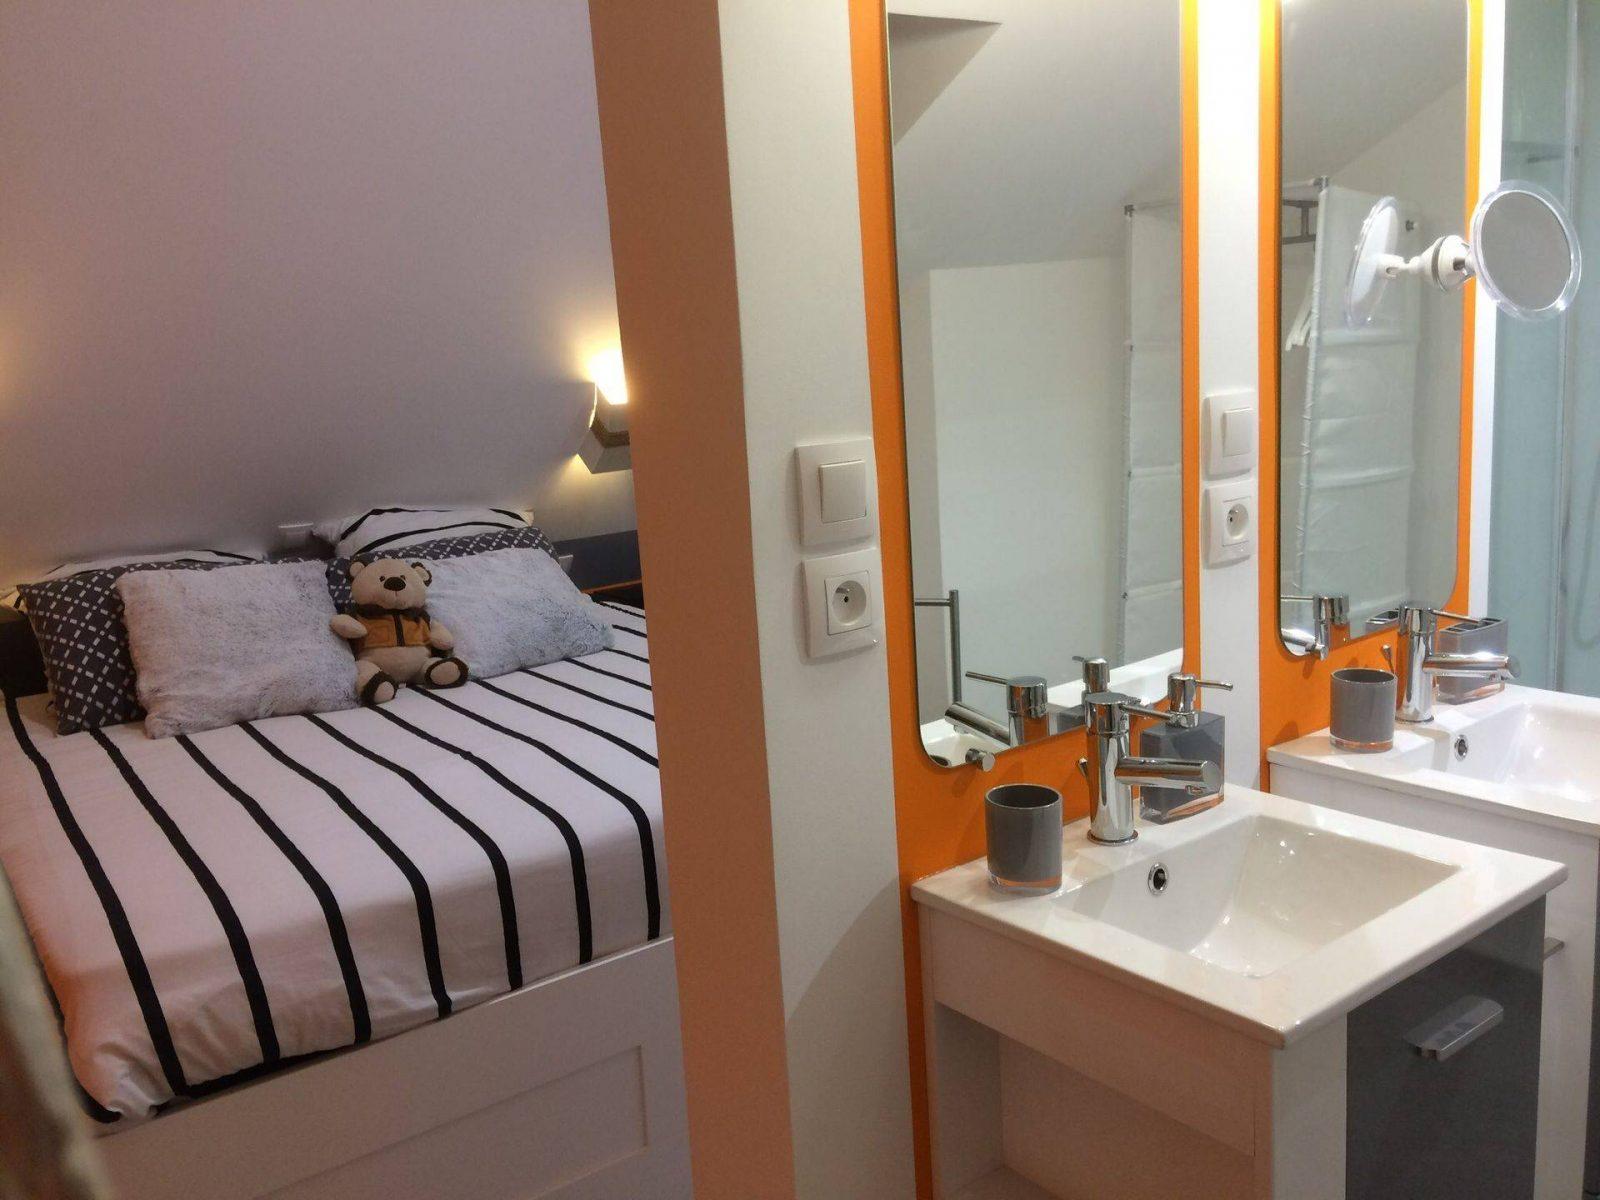 clos-dessyag-montcavrel-chambre-salle-de-bains